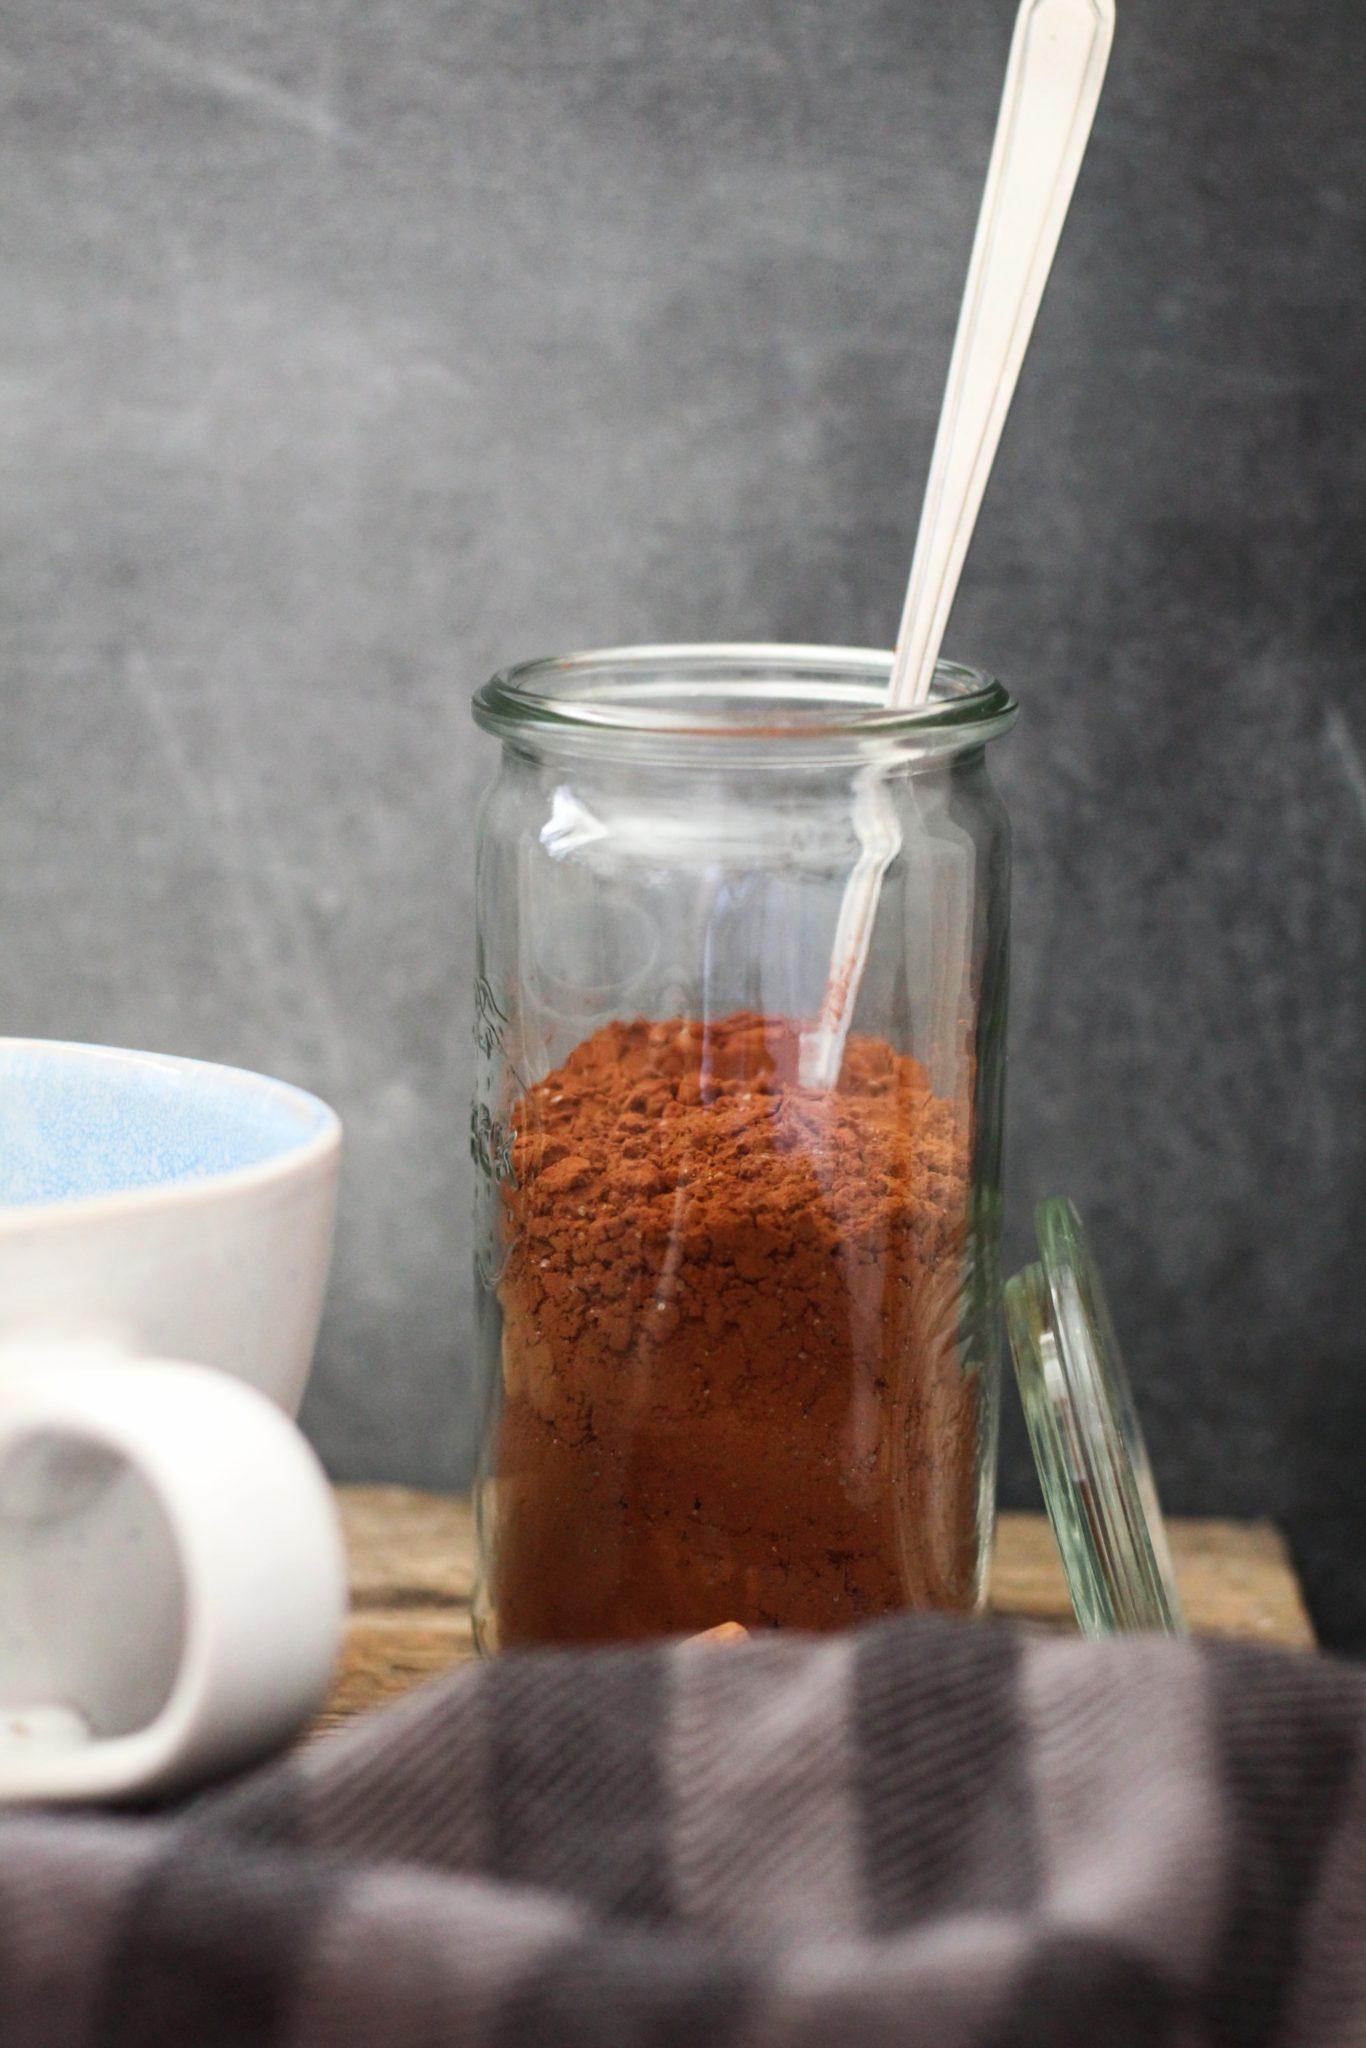 Hjemmelavet vegansk kakaopulver til varm kakao